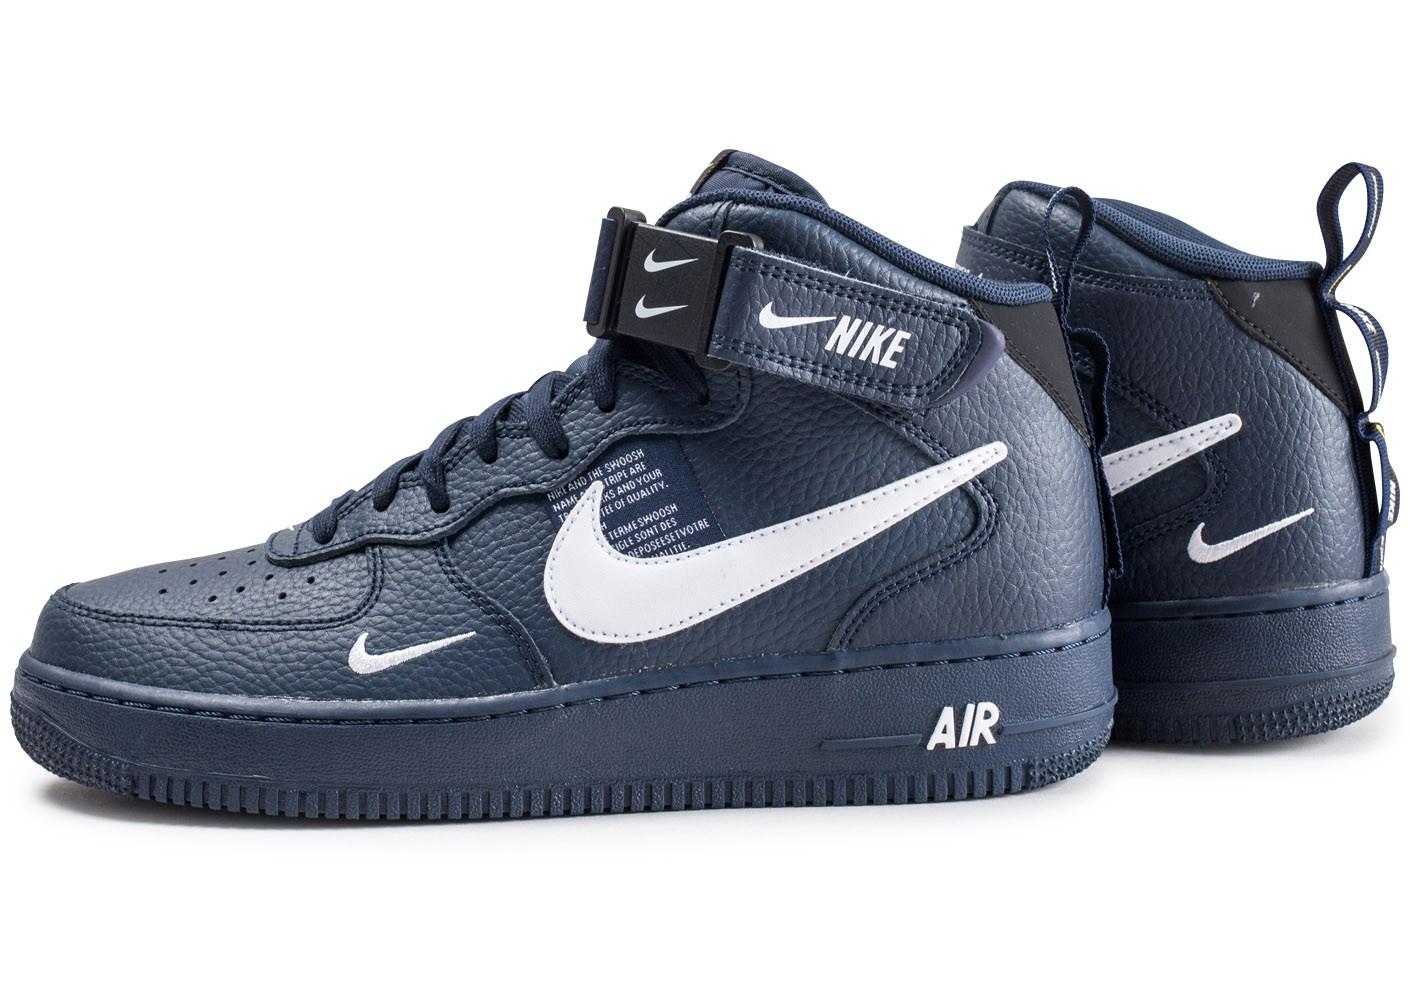 Force Mid Sneaker 1 Lv8 Air ''obsidian'' Utility Nike Style '07 TcJFKl13